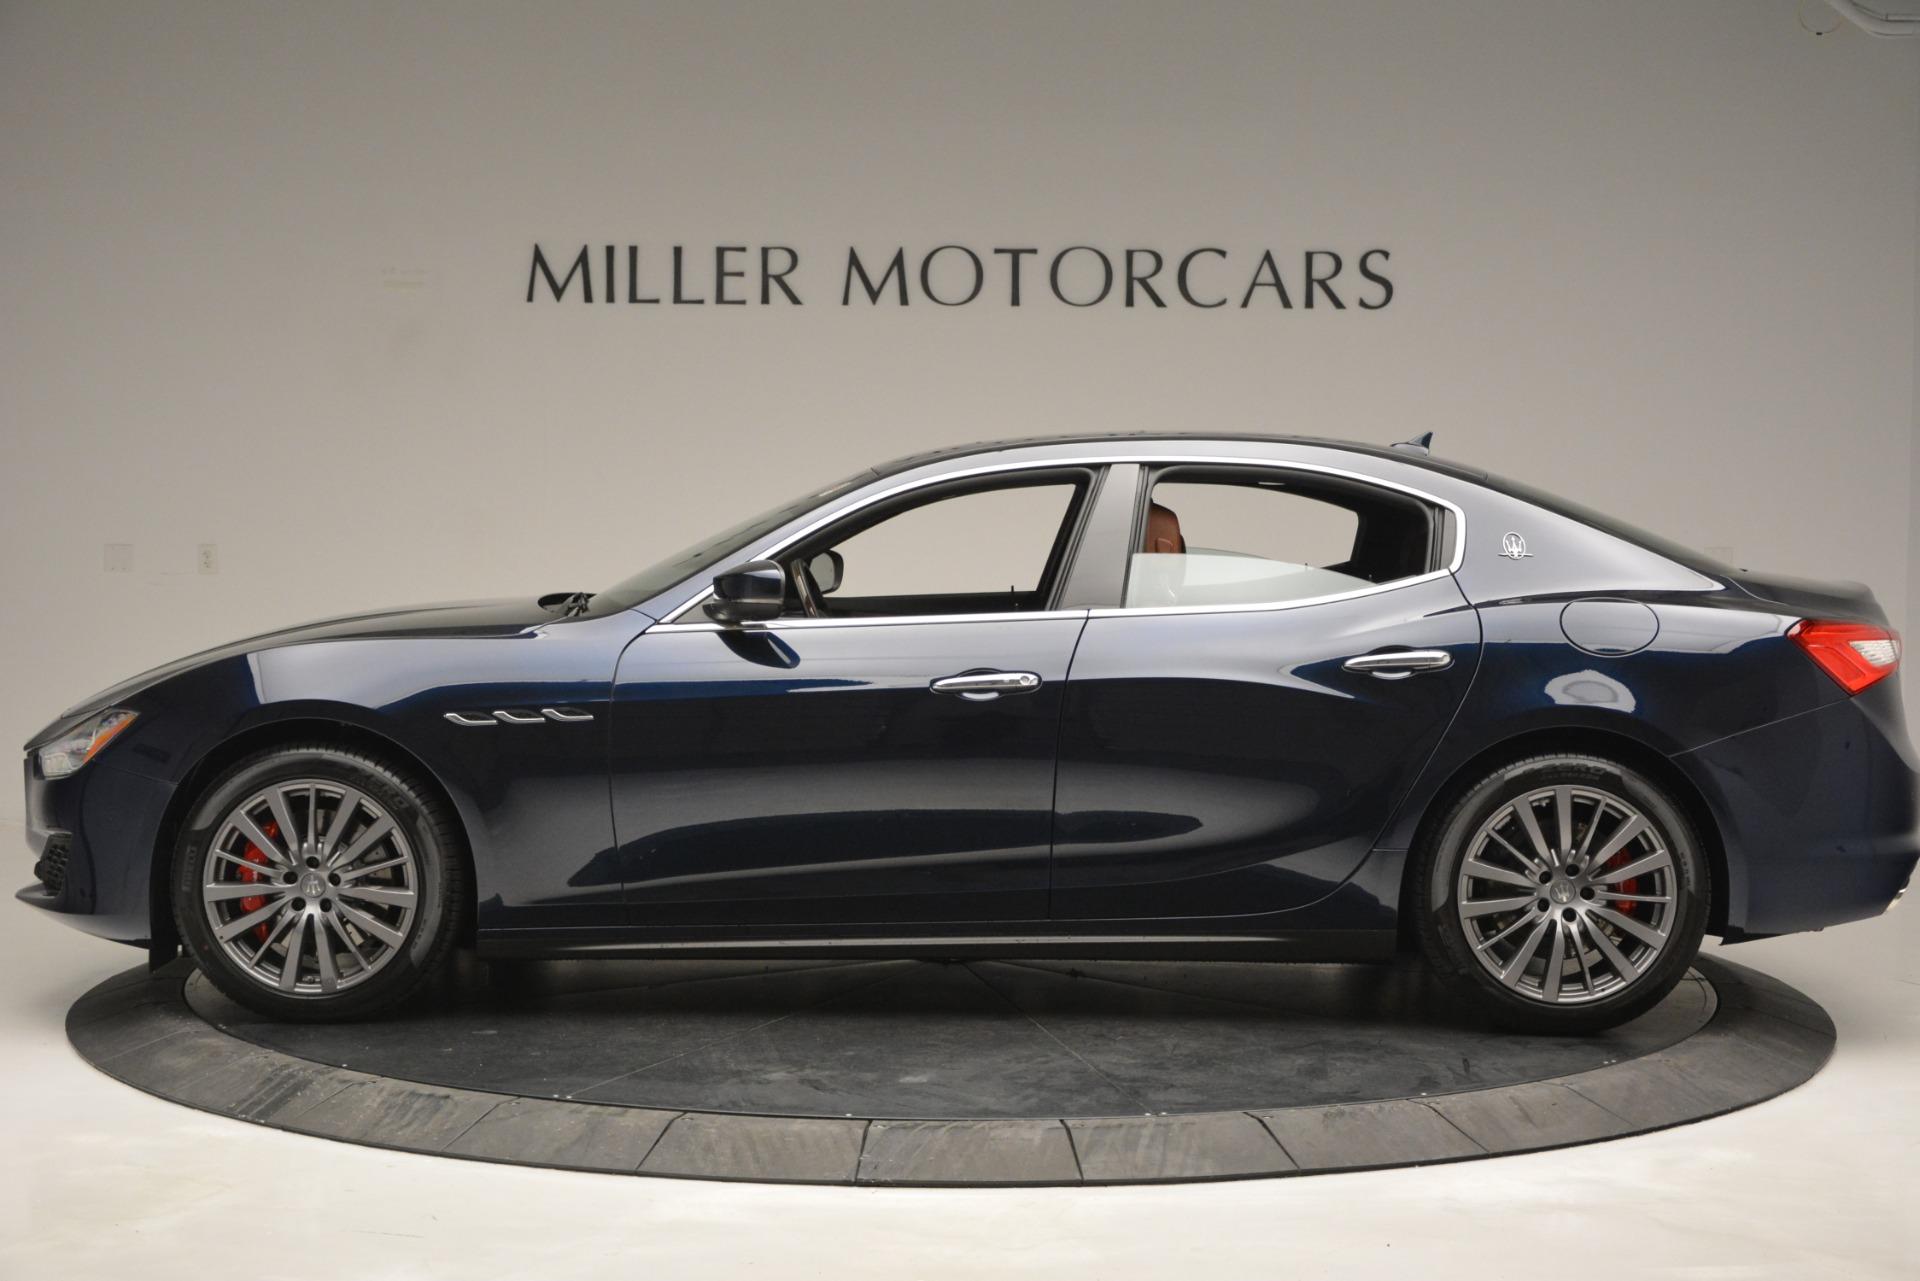 New 2019 Maserati Ghibli S Q4 For Sale In Westport, CT 2862_p3